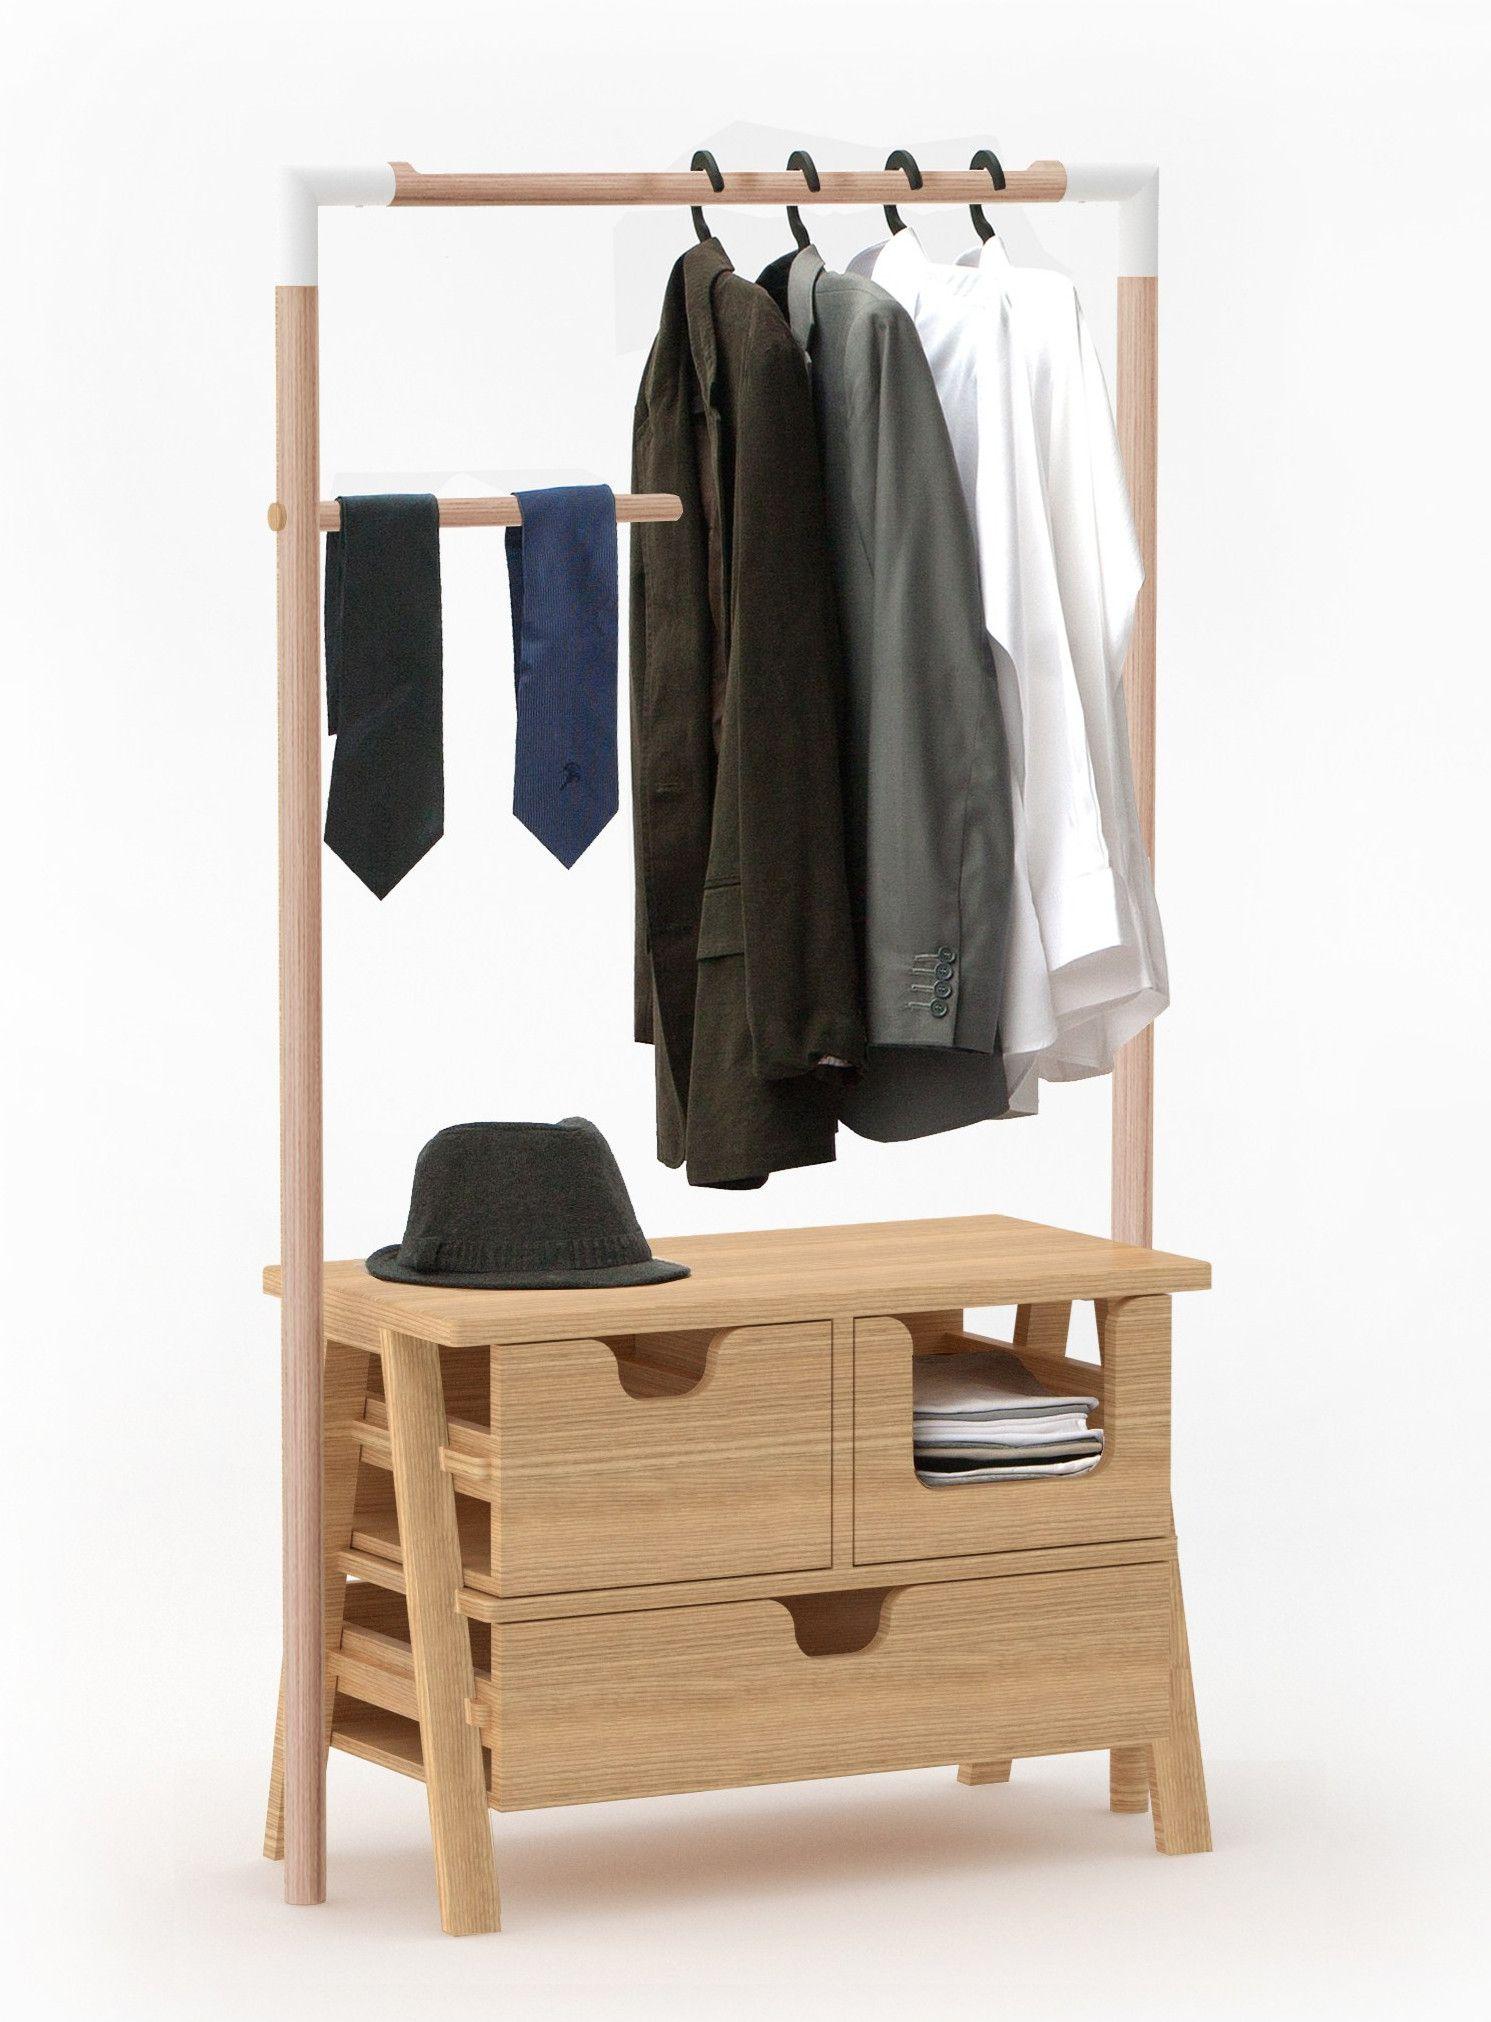 Teak coat rack 7 DAYS by Specimen Editions